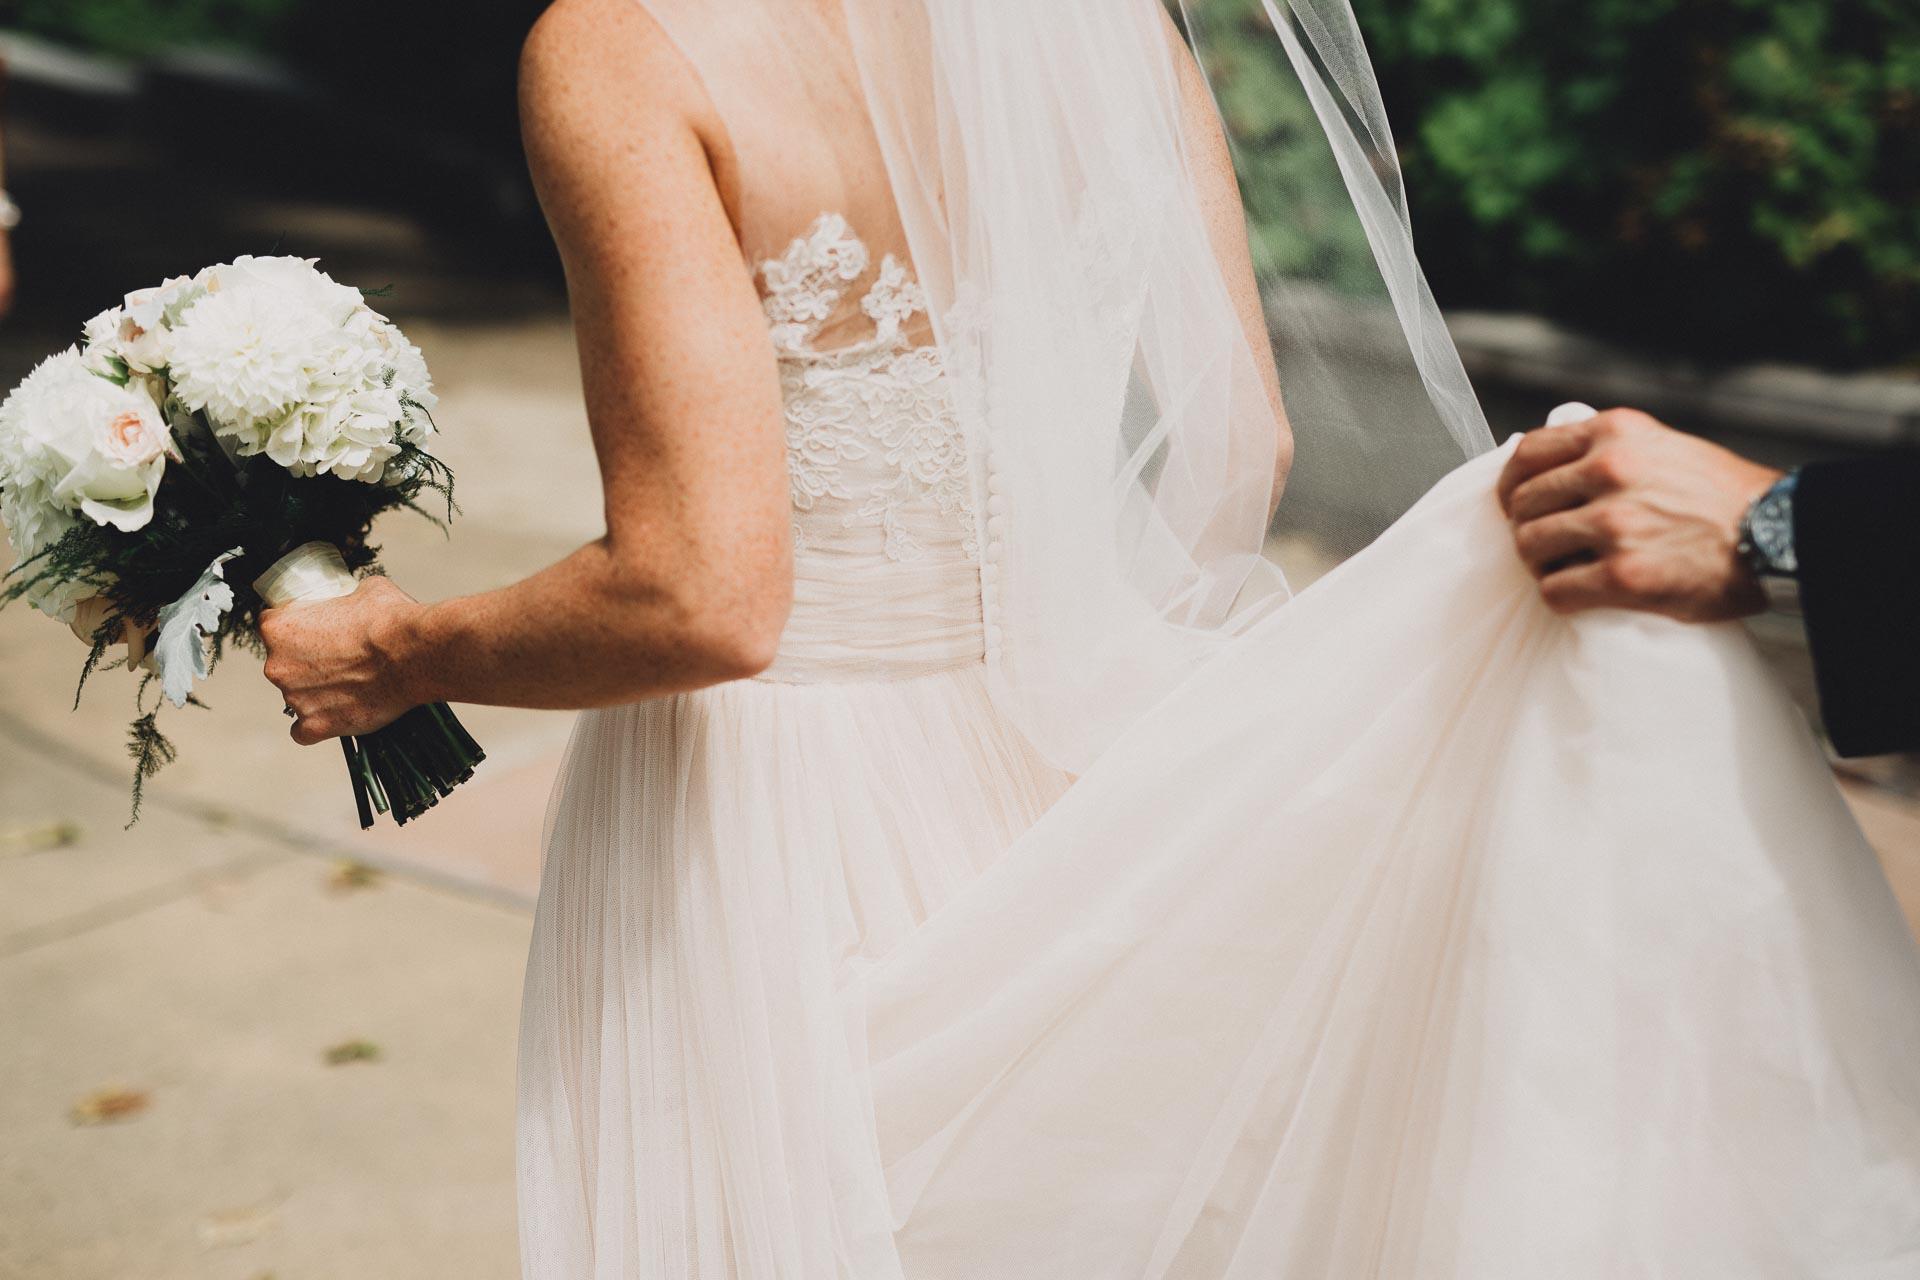 Emily-Eddie-Cincinnati-Rennaissance-Hotel-Wedding-050@2x.jpg